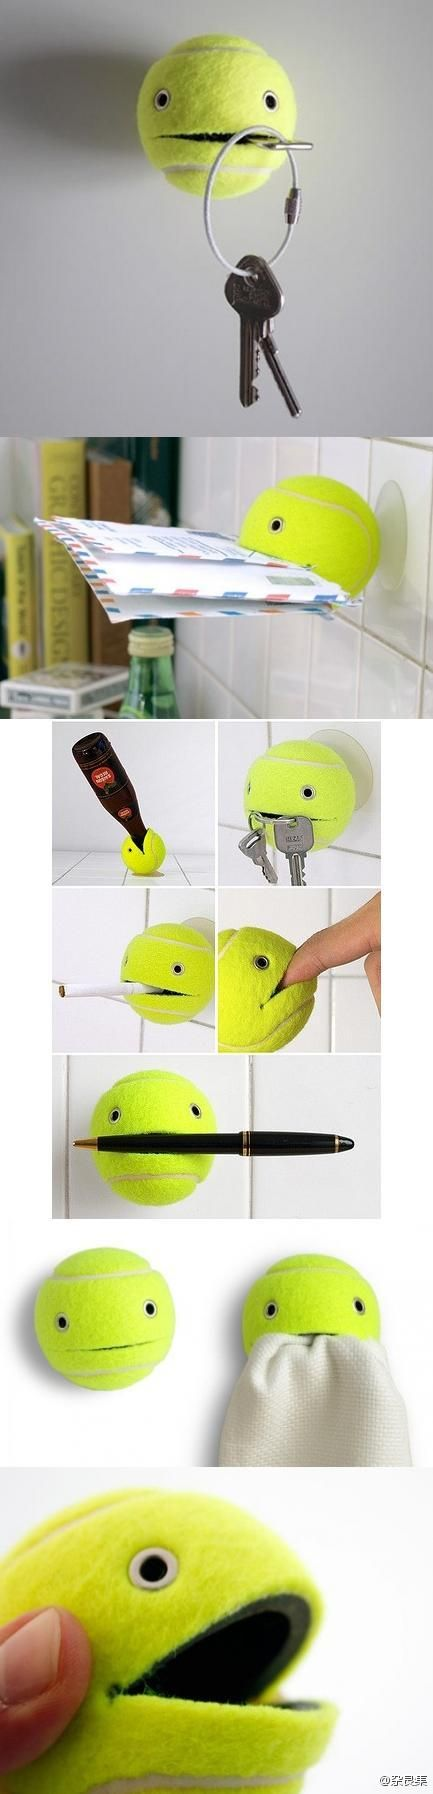 Cute and useful...